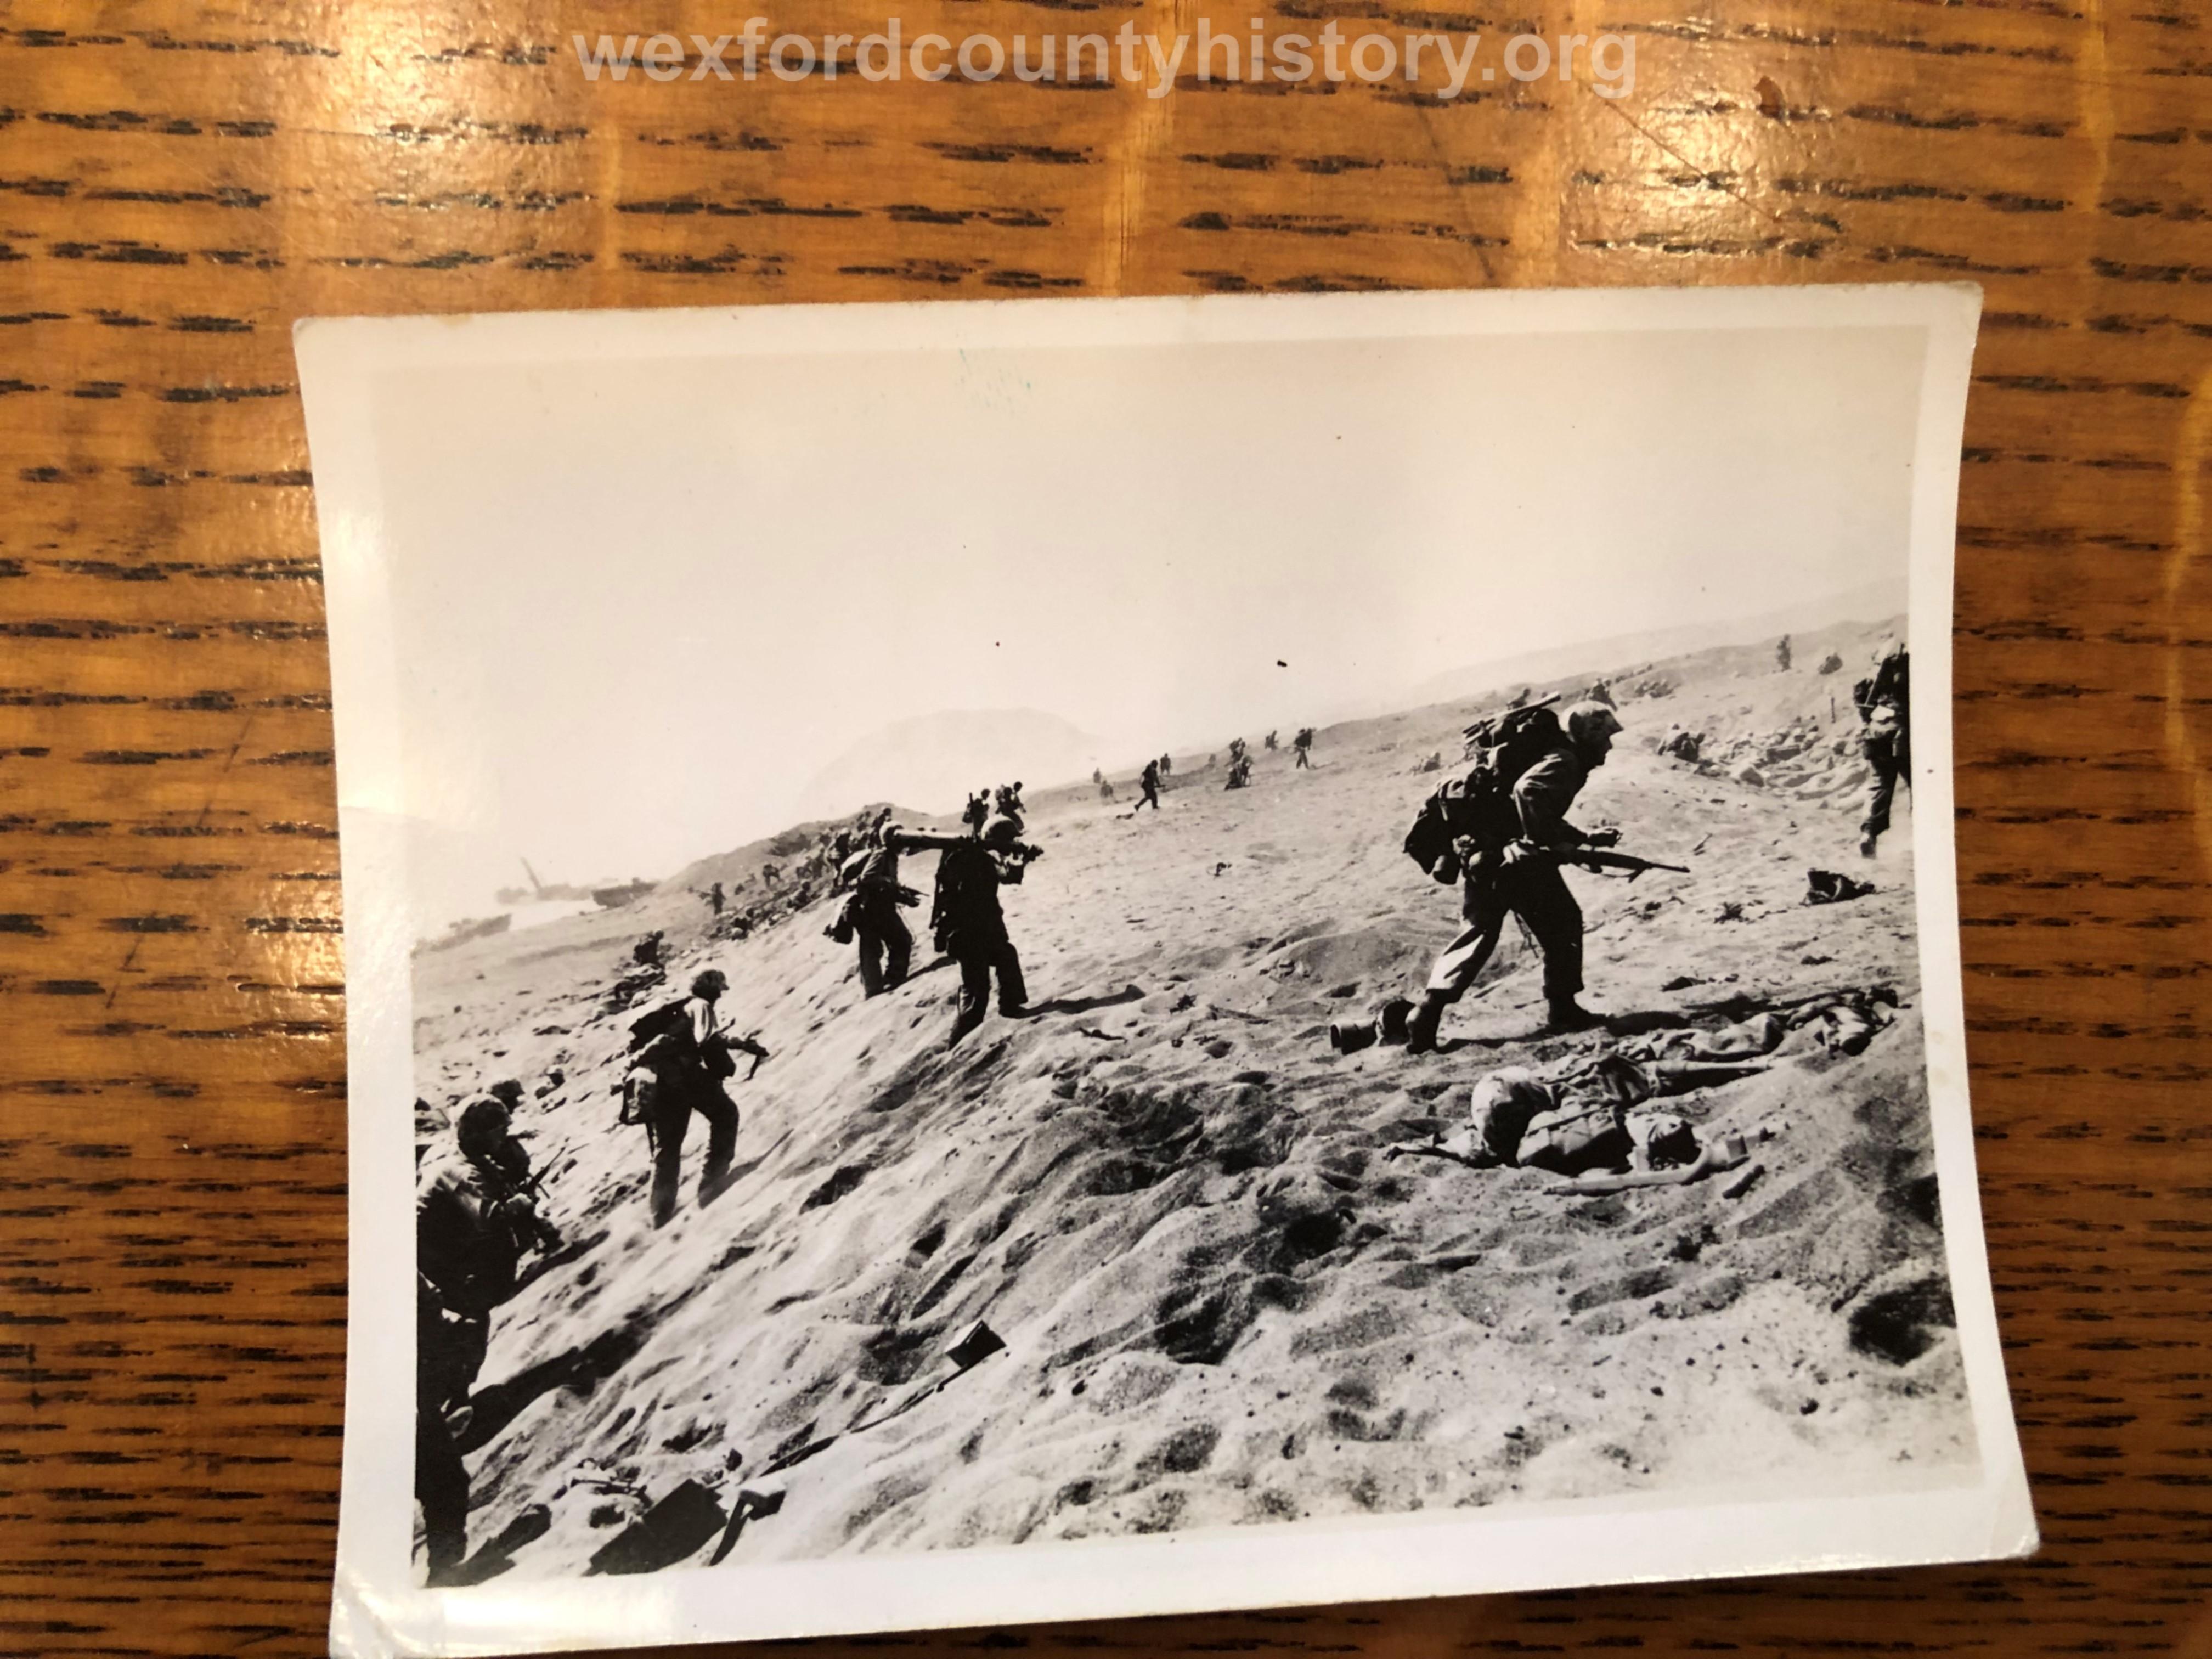 Cadillac-Veterans-Paul-Johnson-World-War-2-Photographs-30